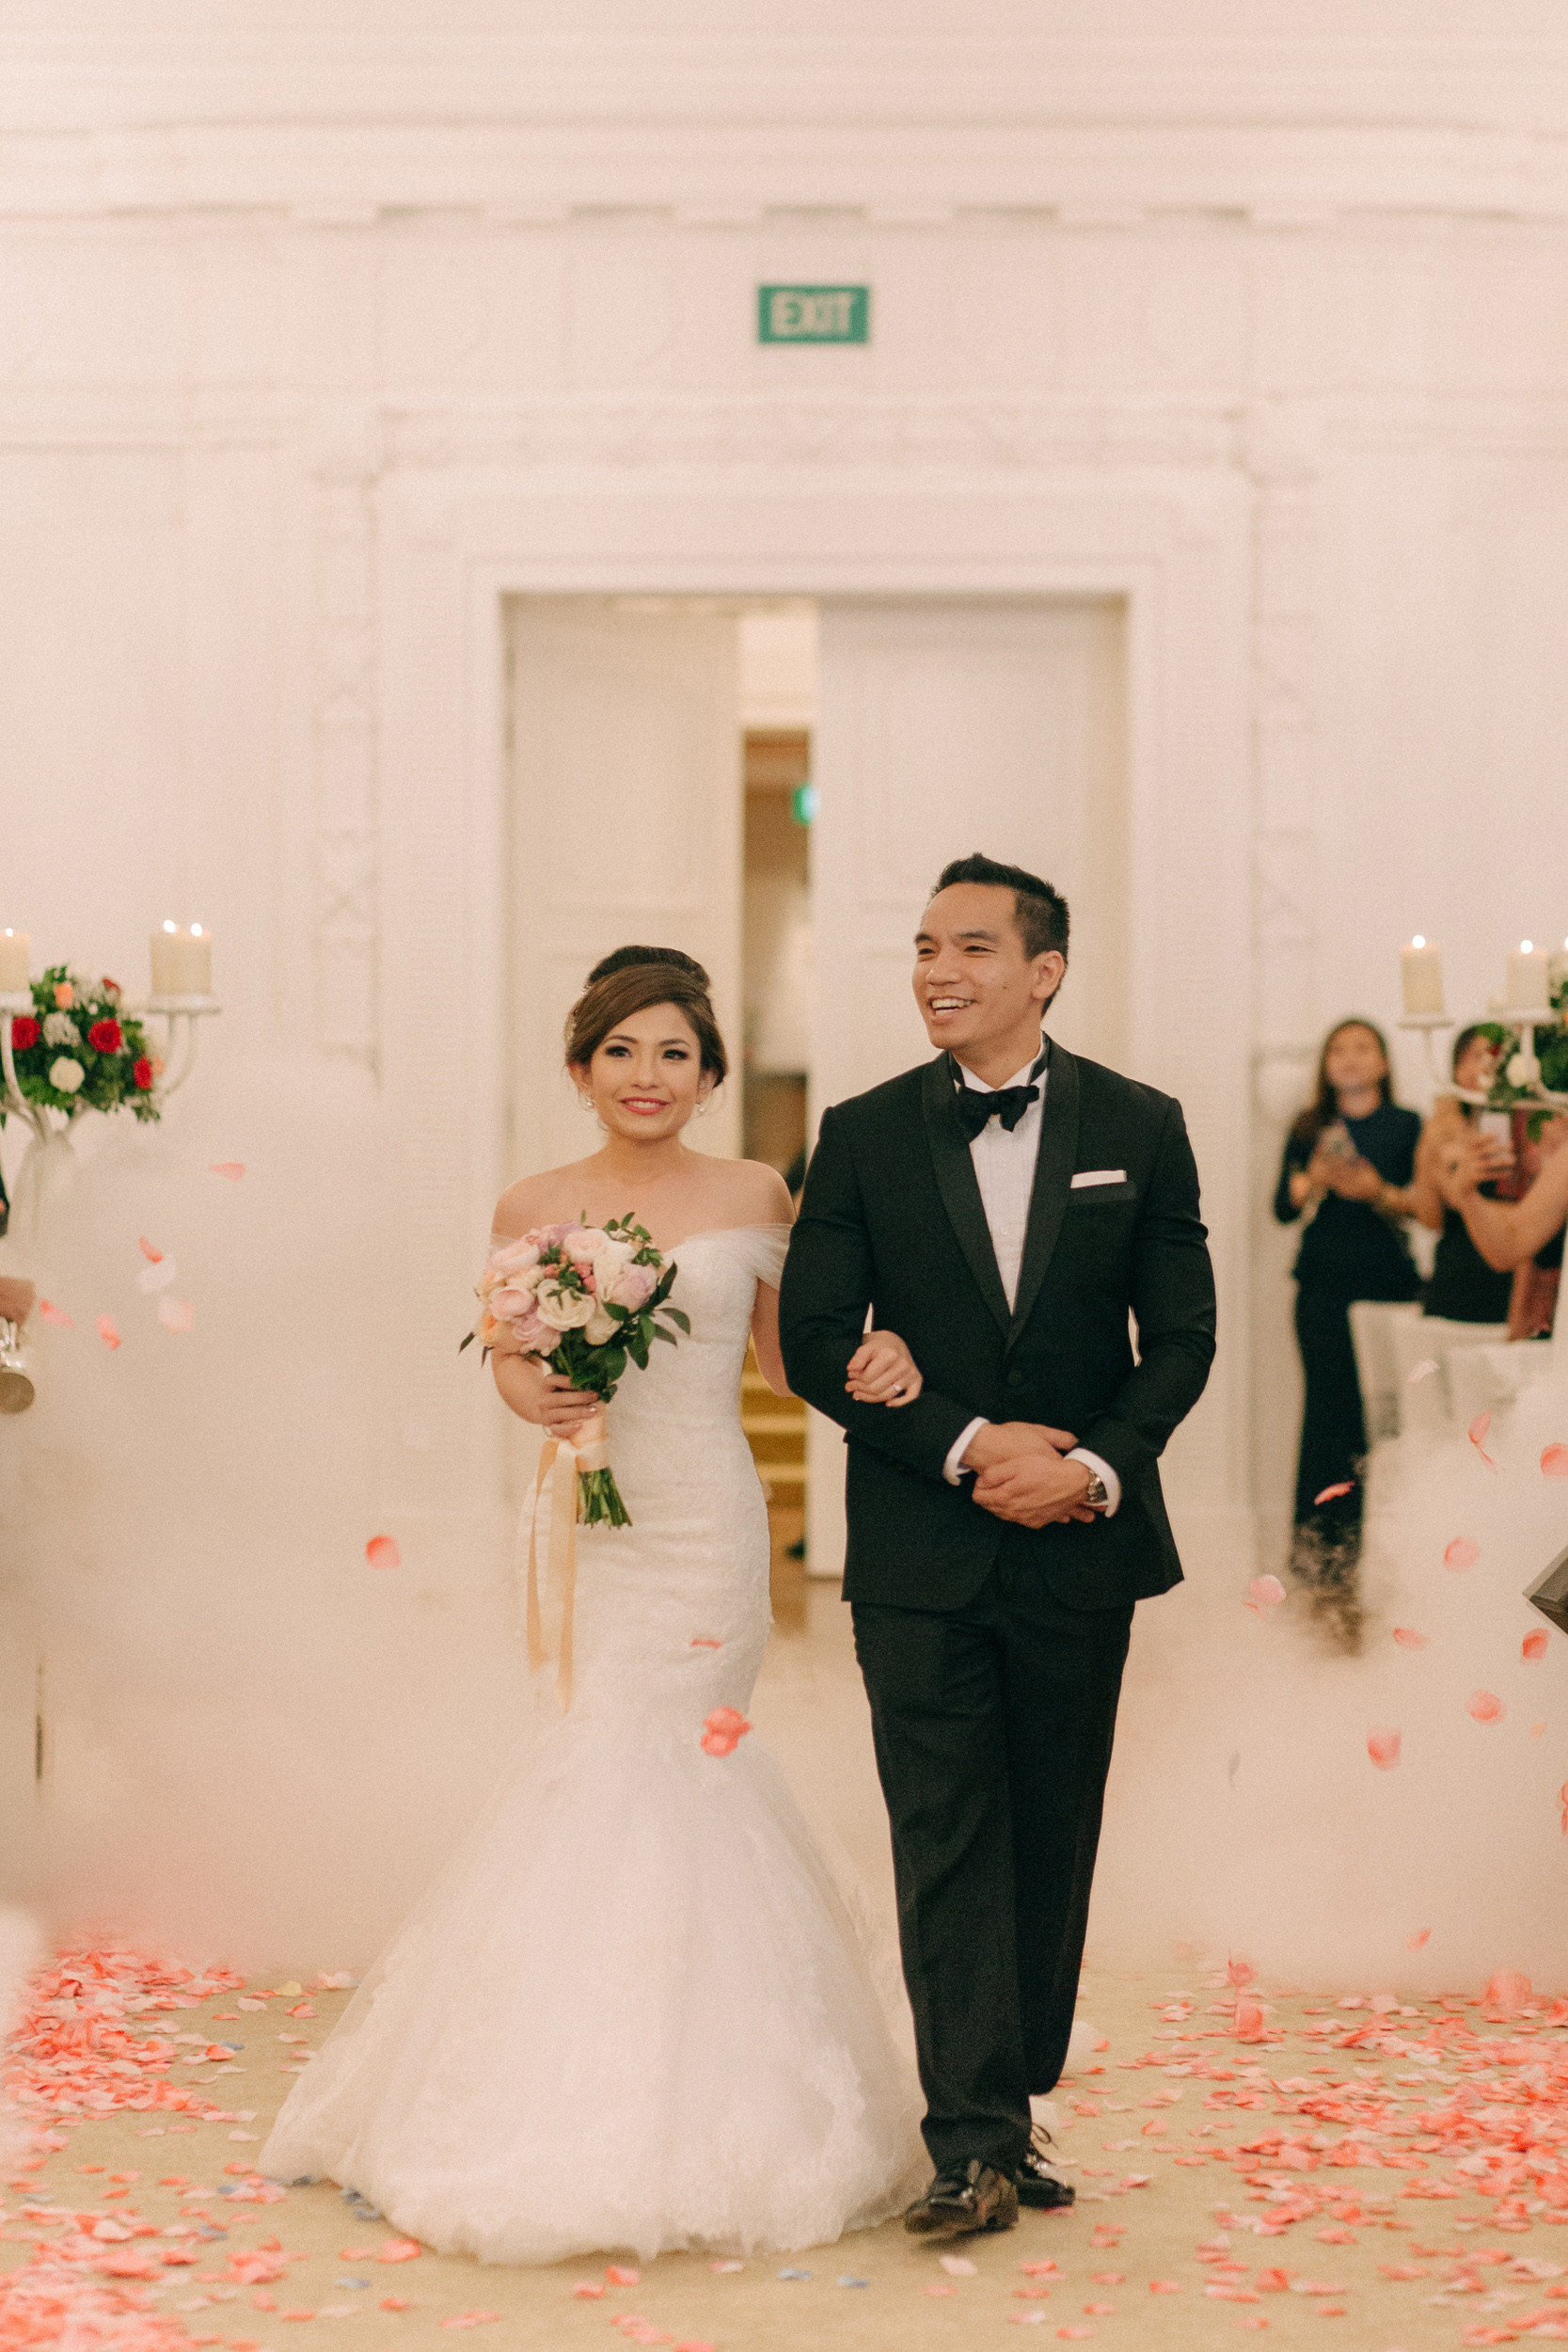 singapore-wedding-photographer-cheryl-matthew-fullerton-hotel-wedding-56.jpg